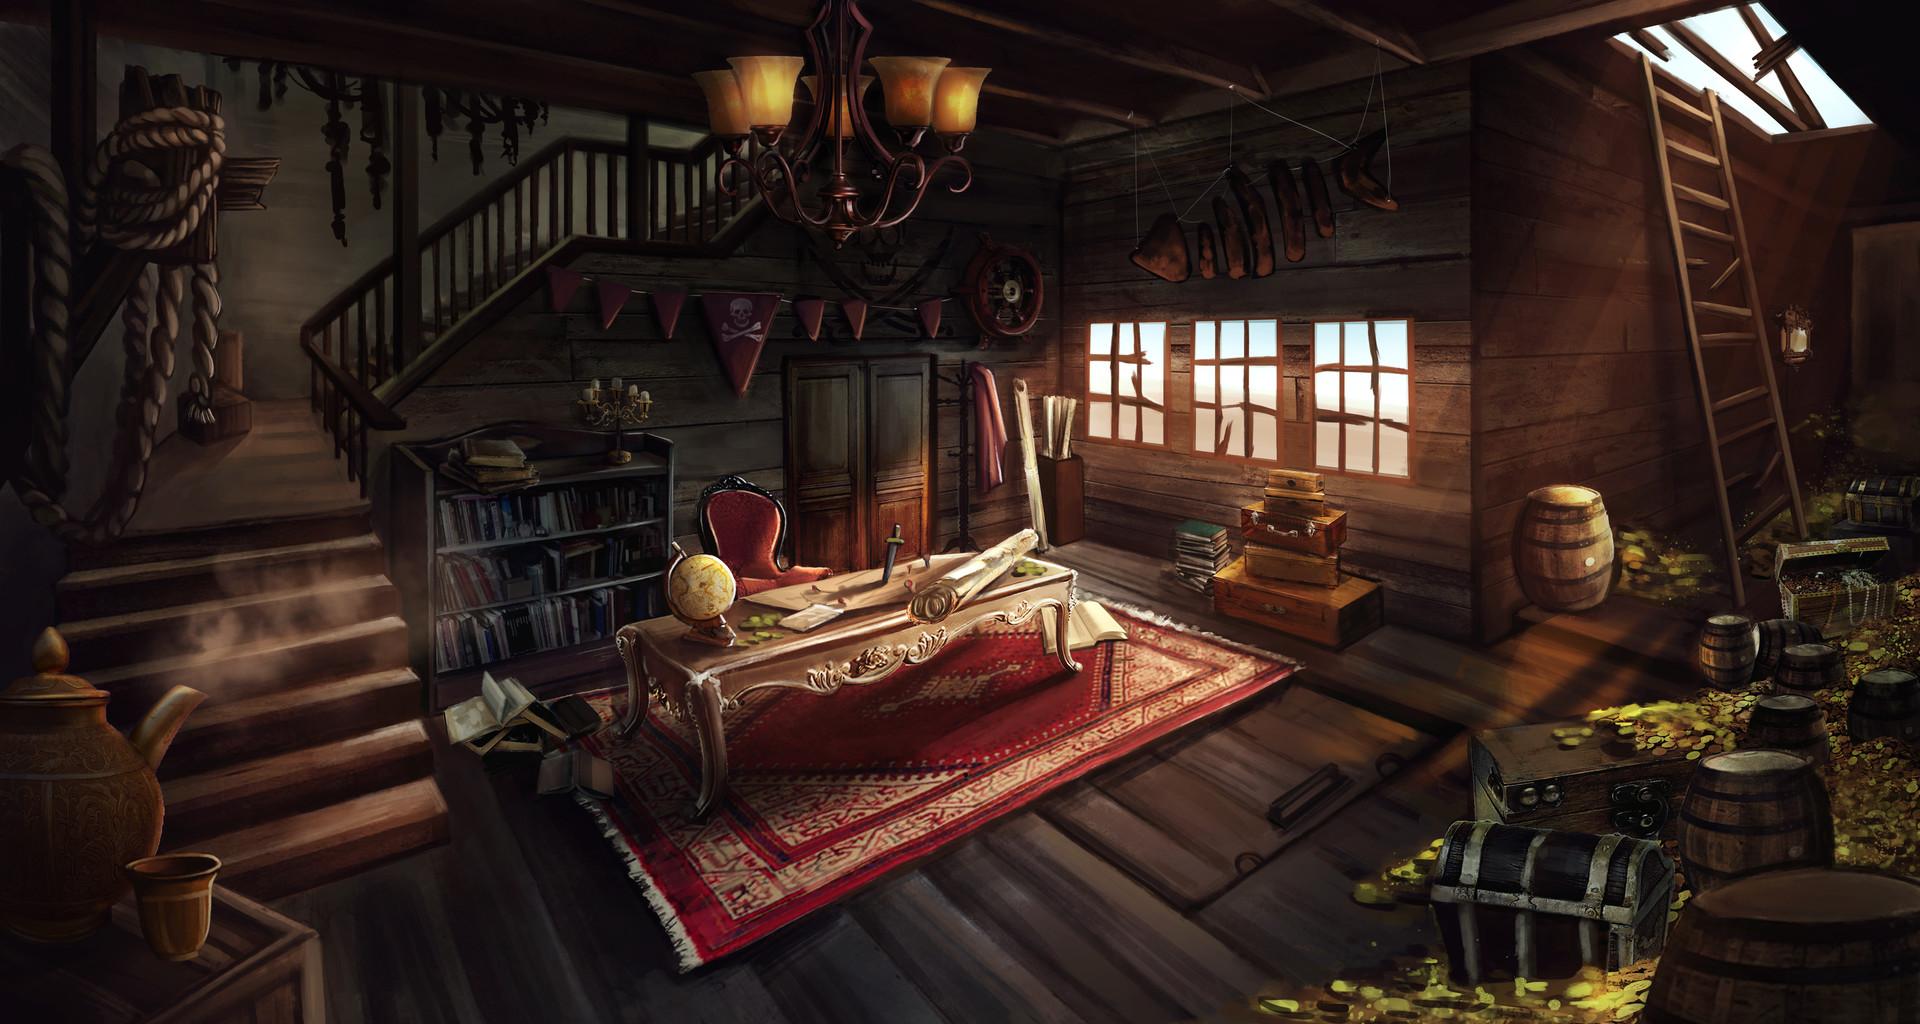 Bedroom Chair Ideas Artstation Pirate Ship Interior Zz Thor